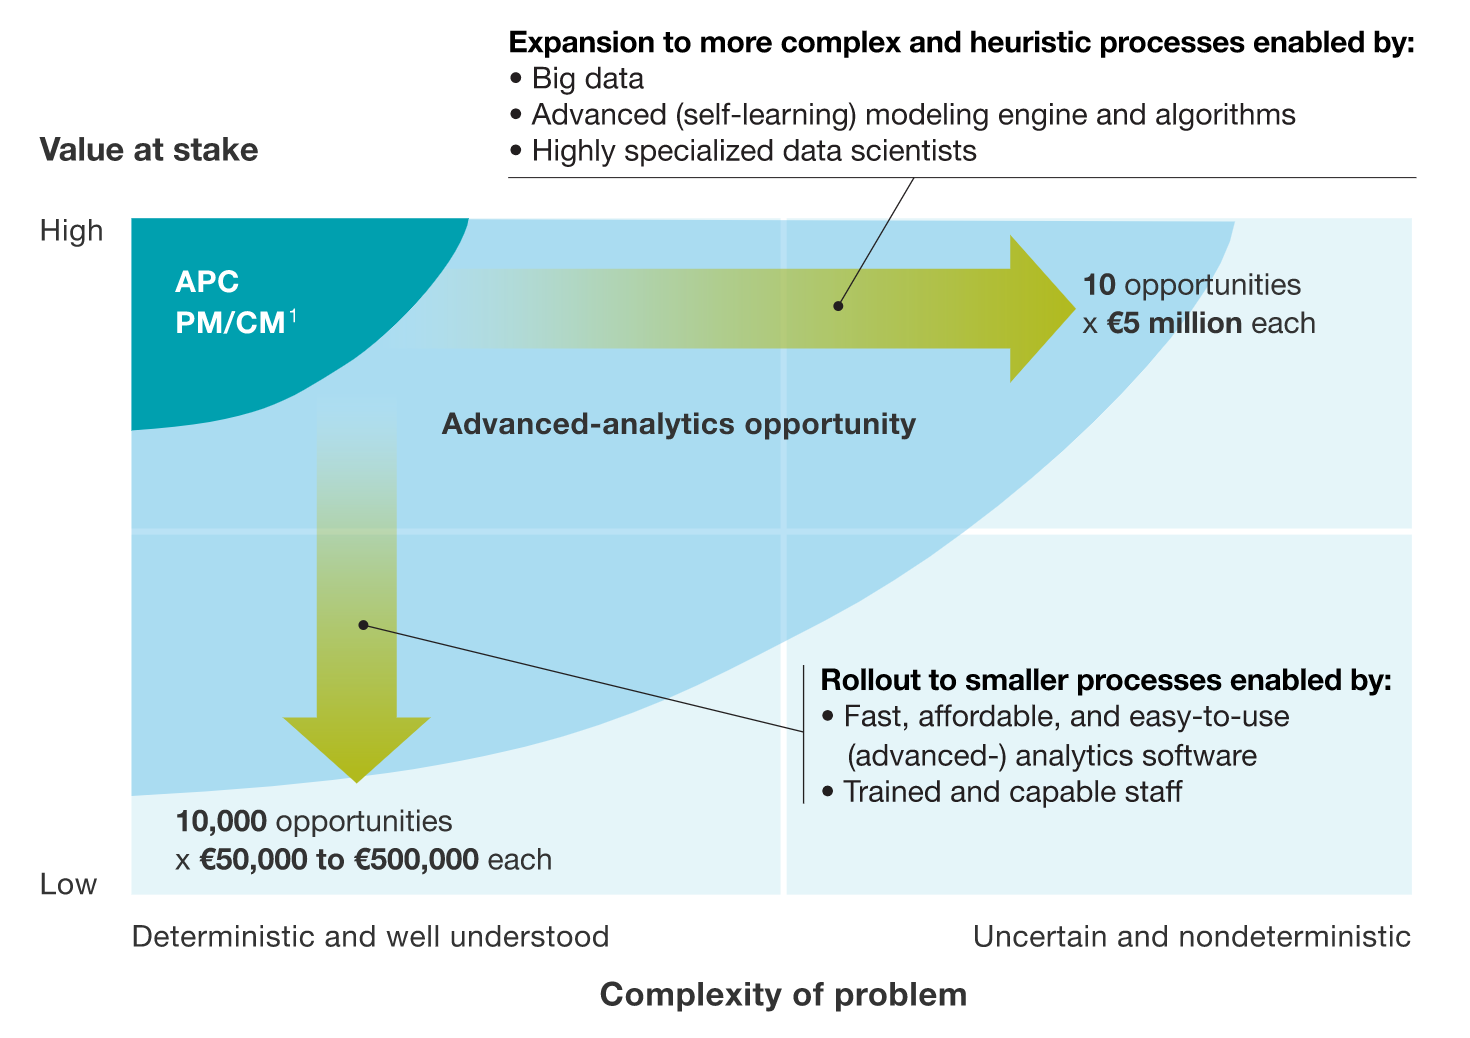 Batch process - advanced analytics